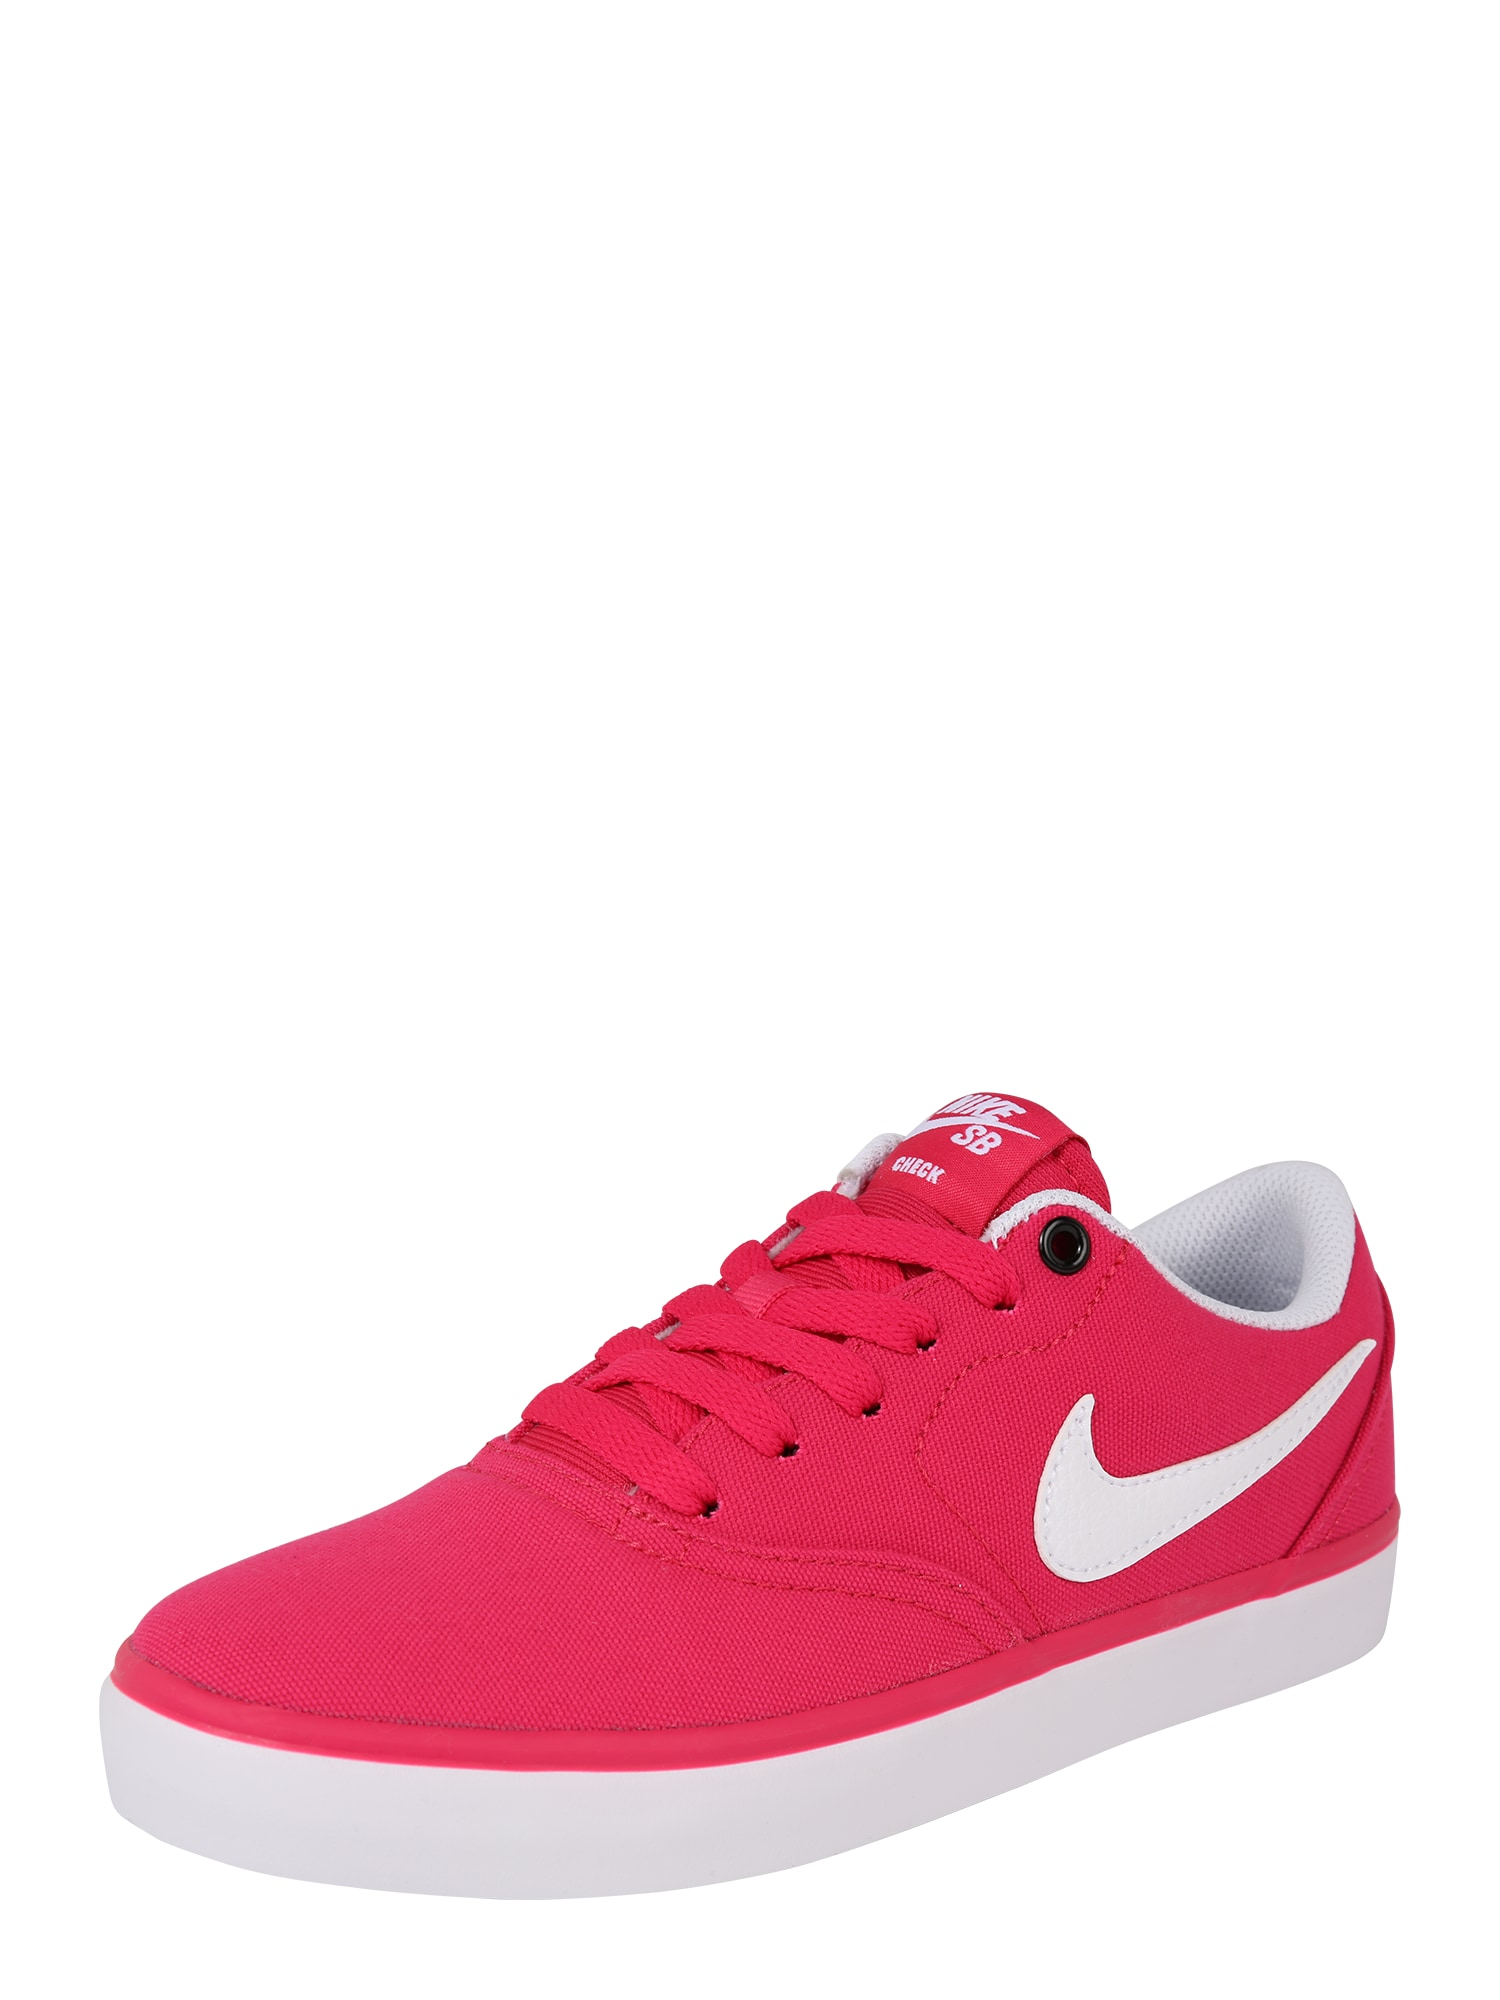 Tenisky Check Solar pink bílá Nike SB